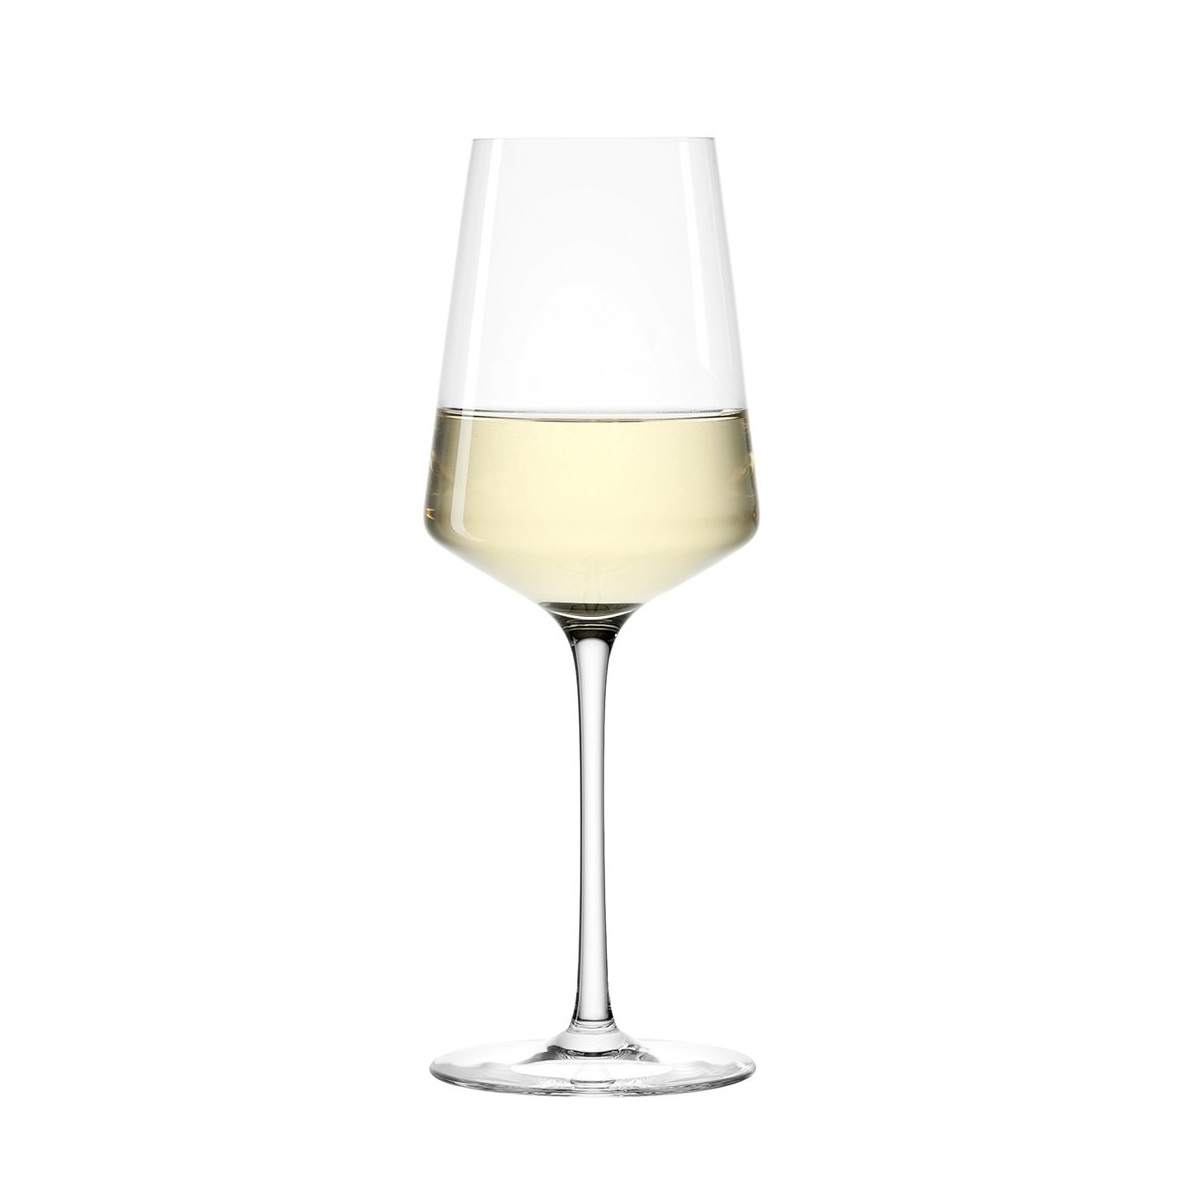 513OF9yO2tL. SL1200  1 - Pahar pentru vin alb Puccini 560 ml (L069553)